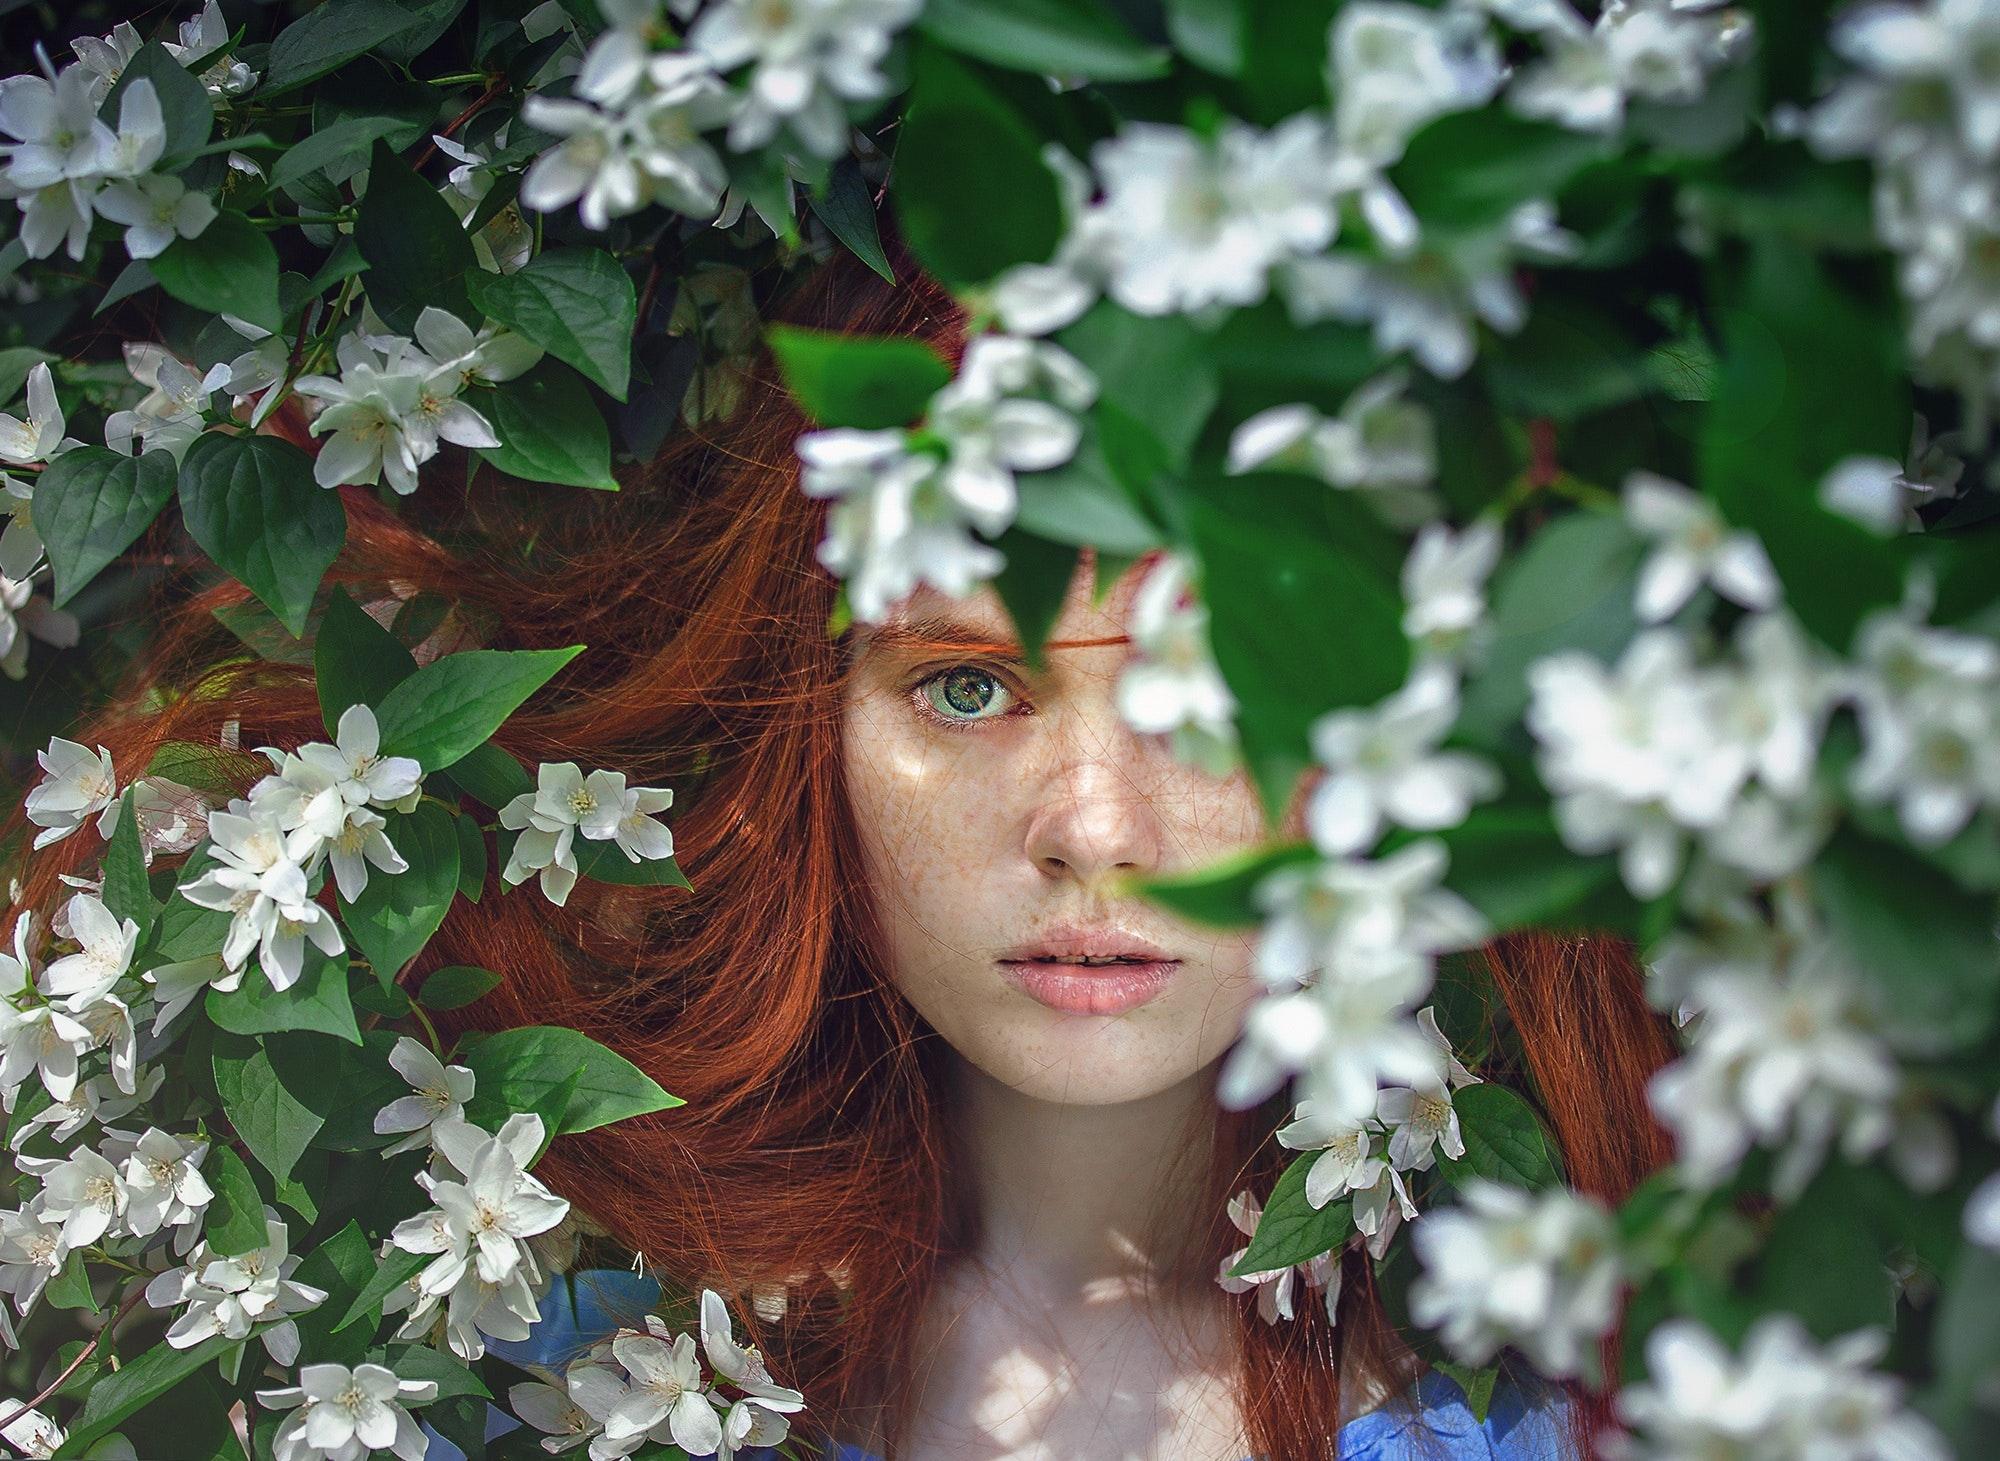 1000 beautiful flower crown photos pexels free stock photos fetching more photos izmirmasajfo